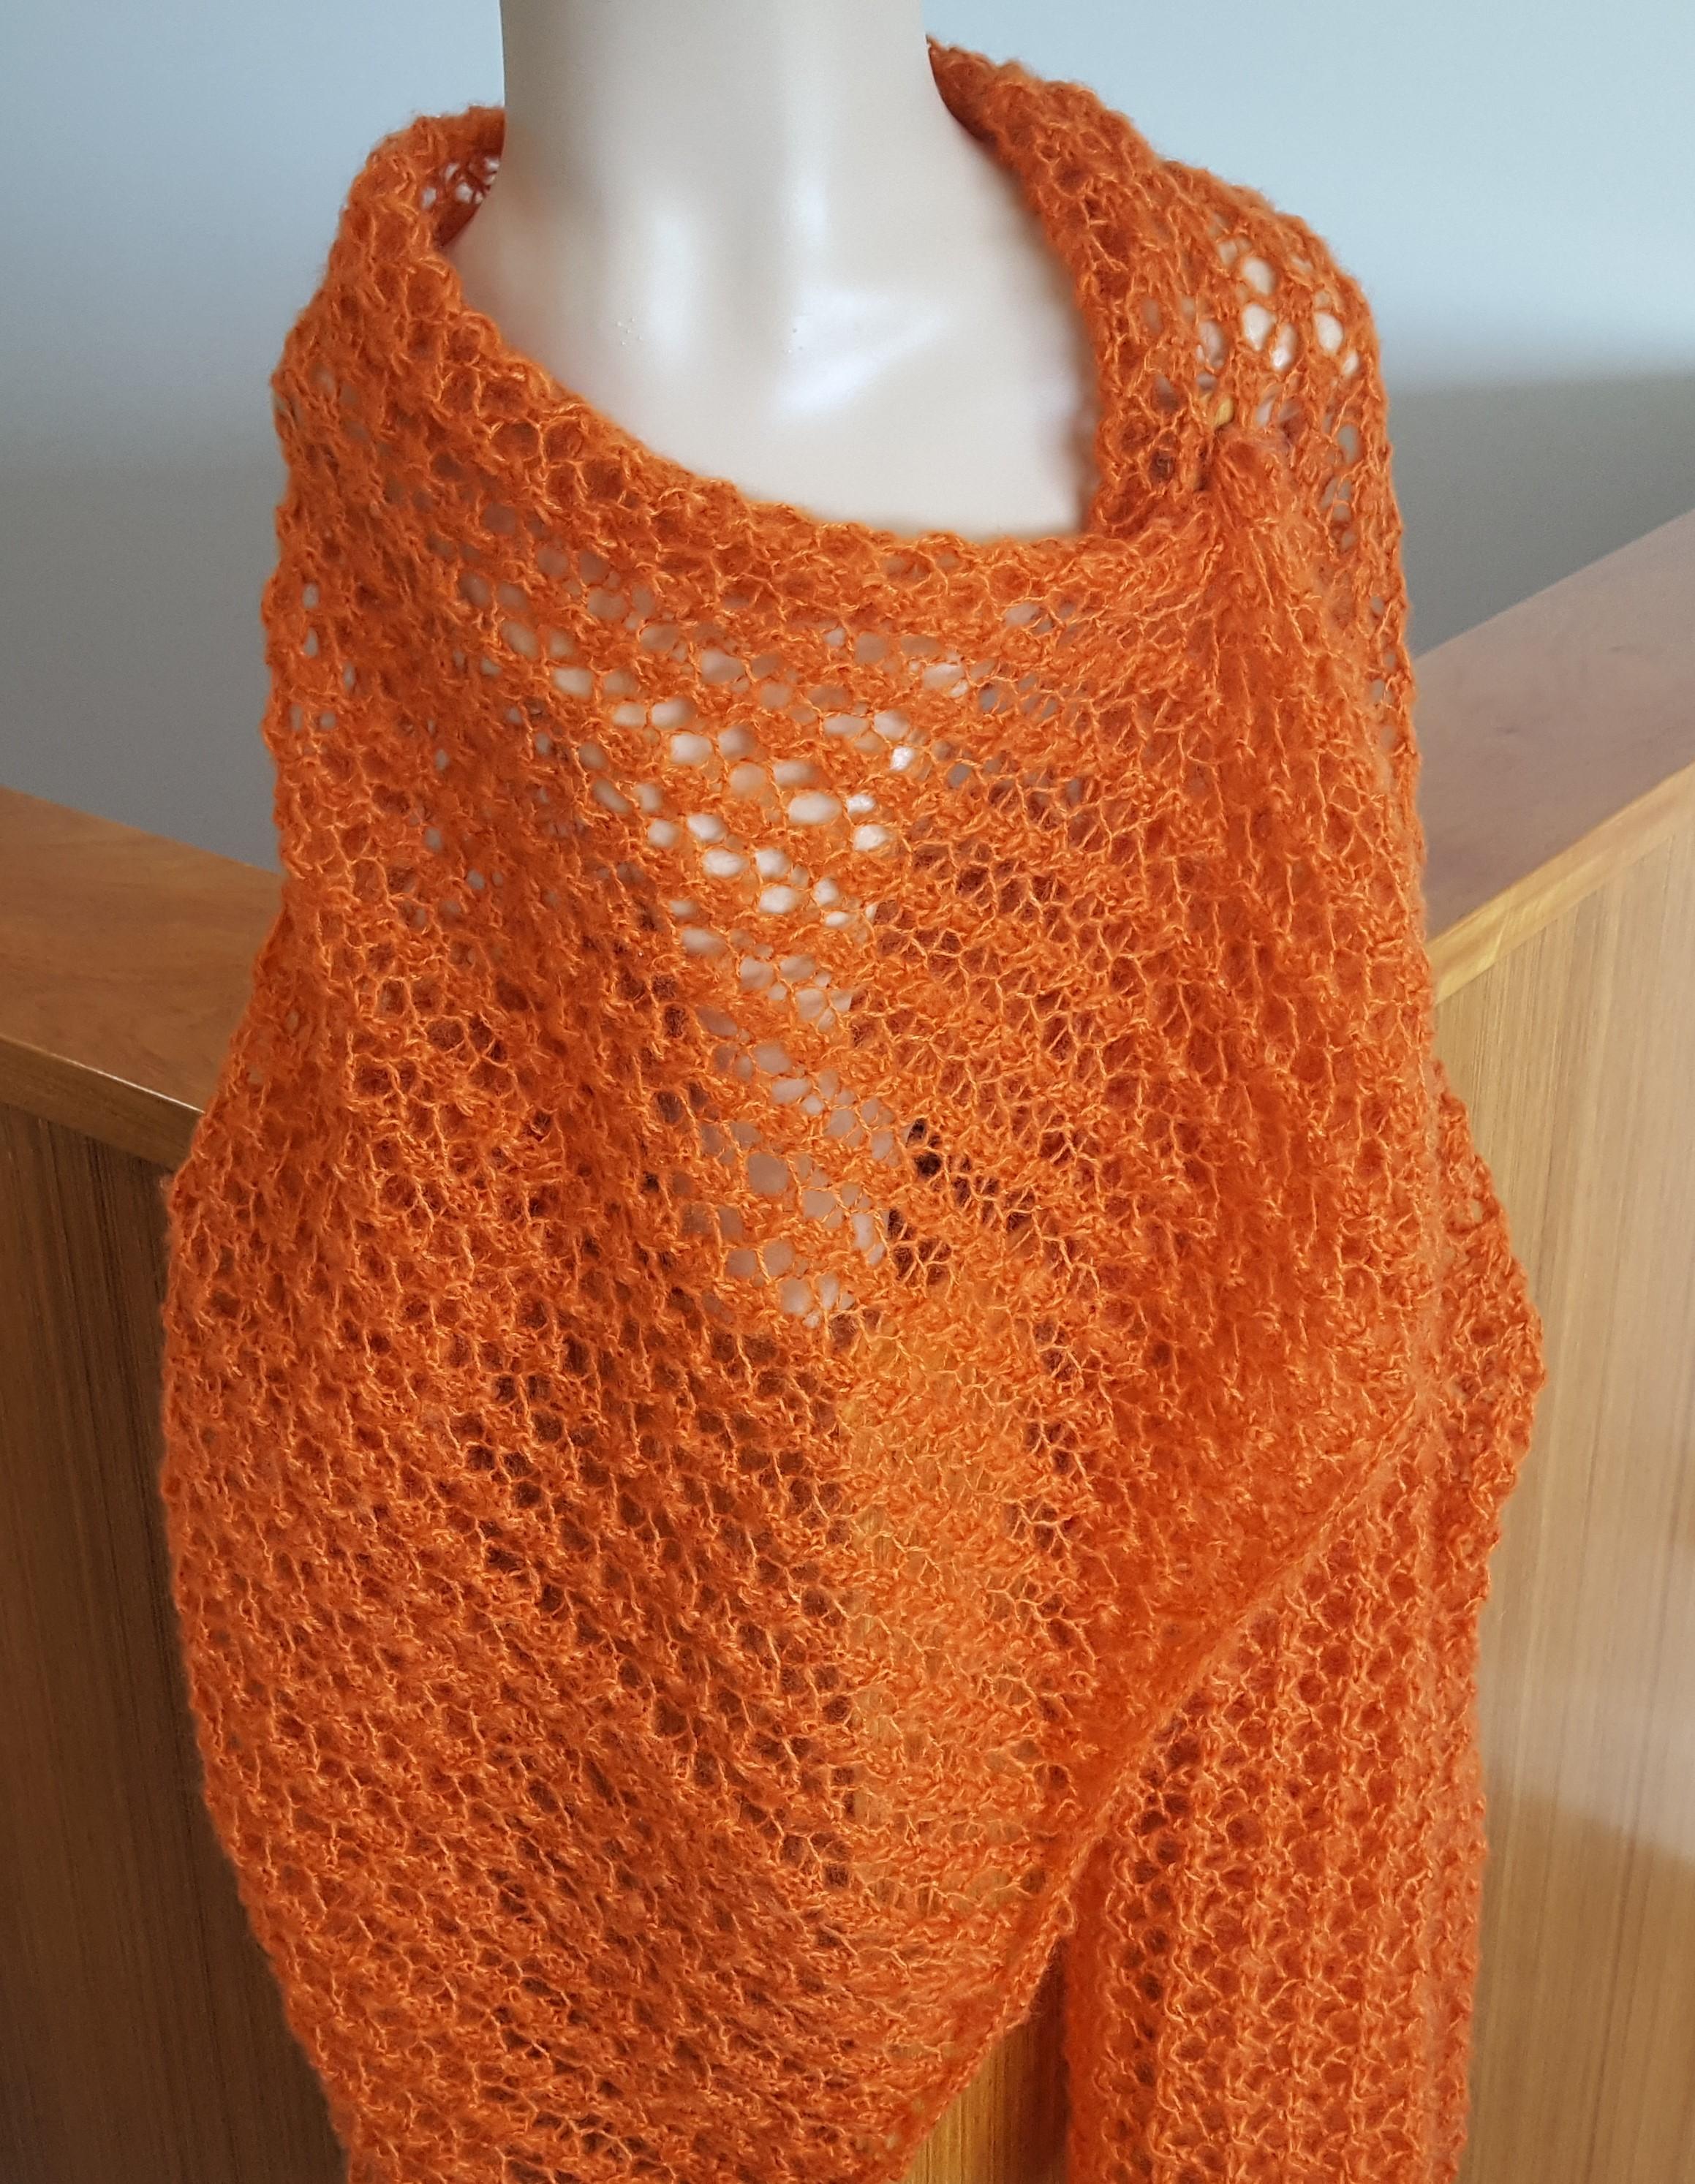 Knitting Patterns Online - Knitting Patterns For Wrap ...